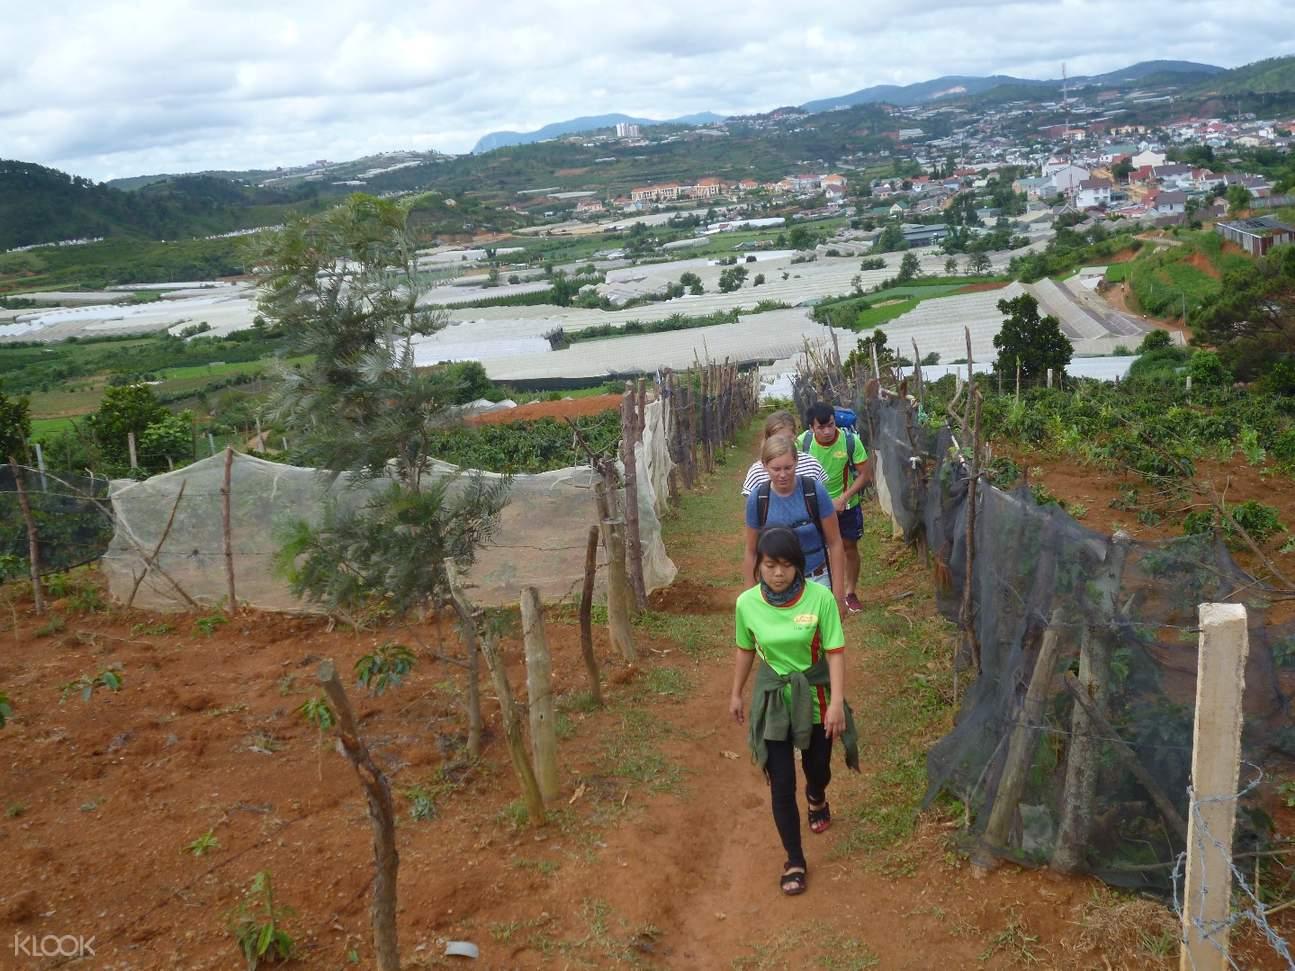 trekking to local farm da lat